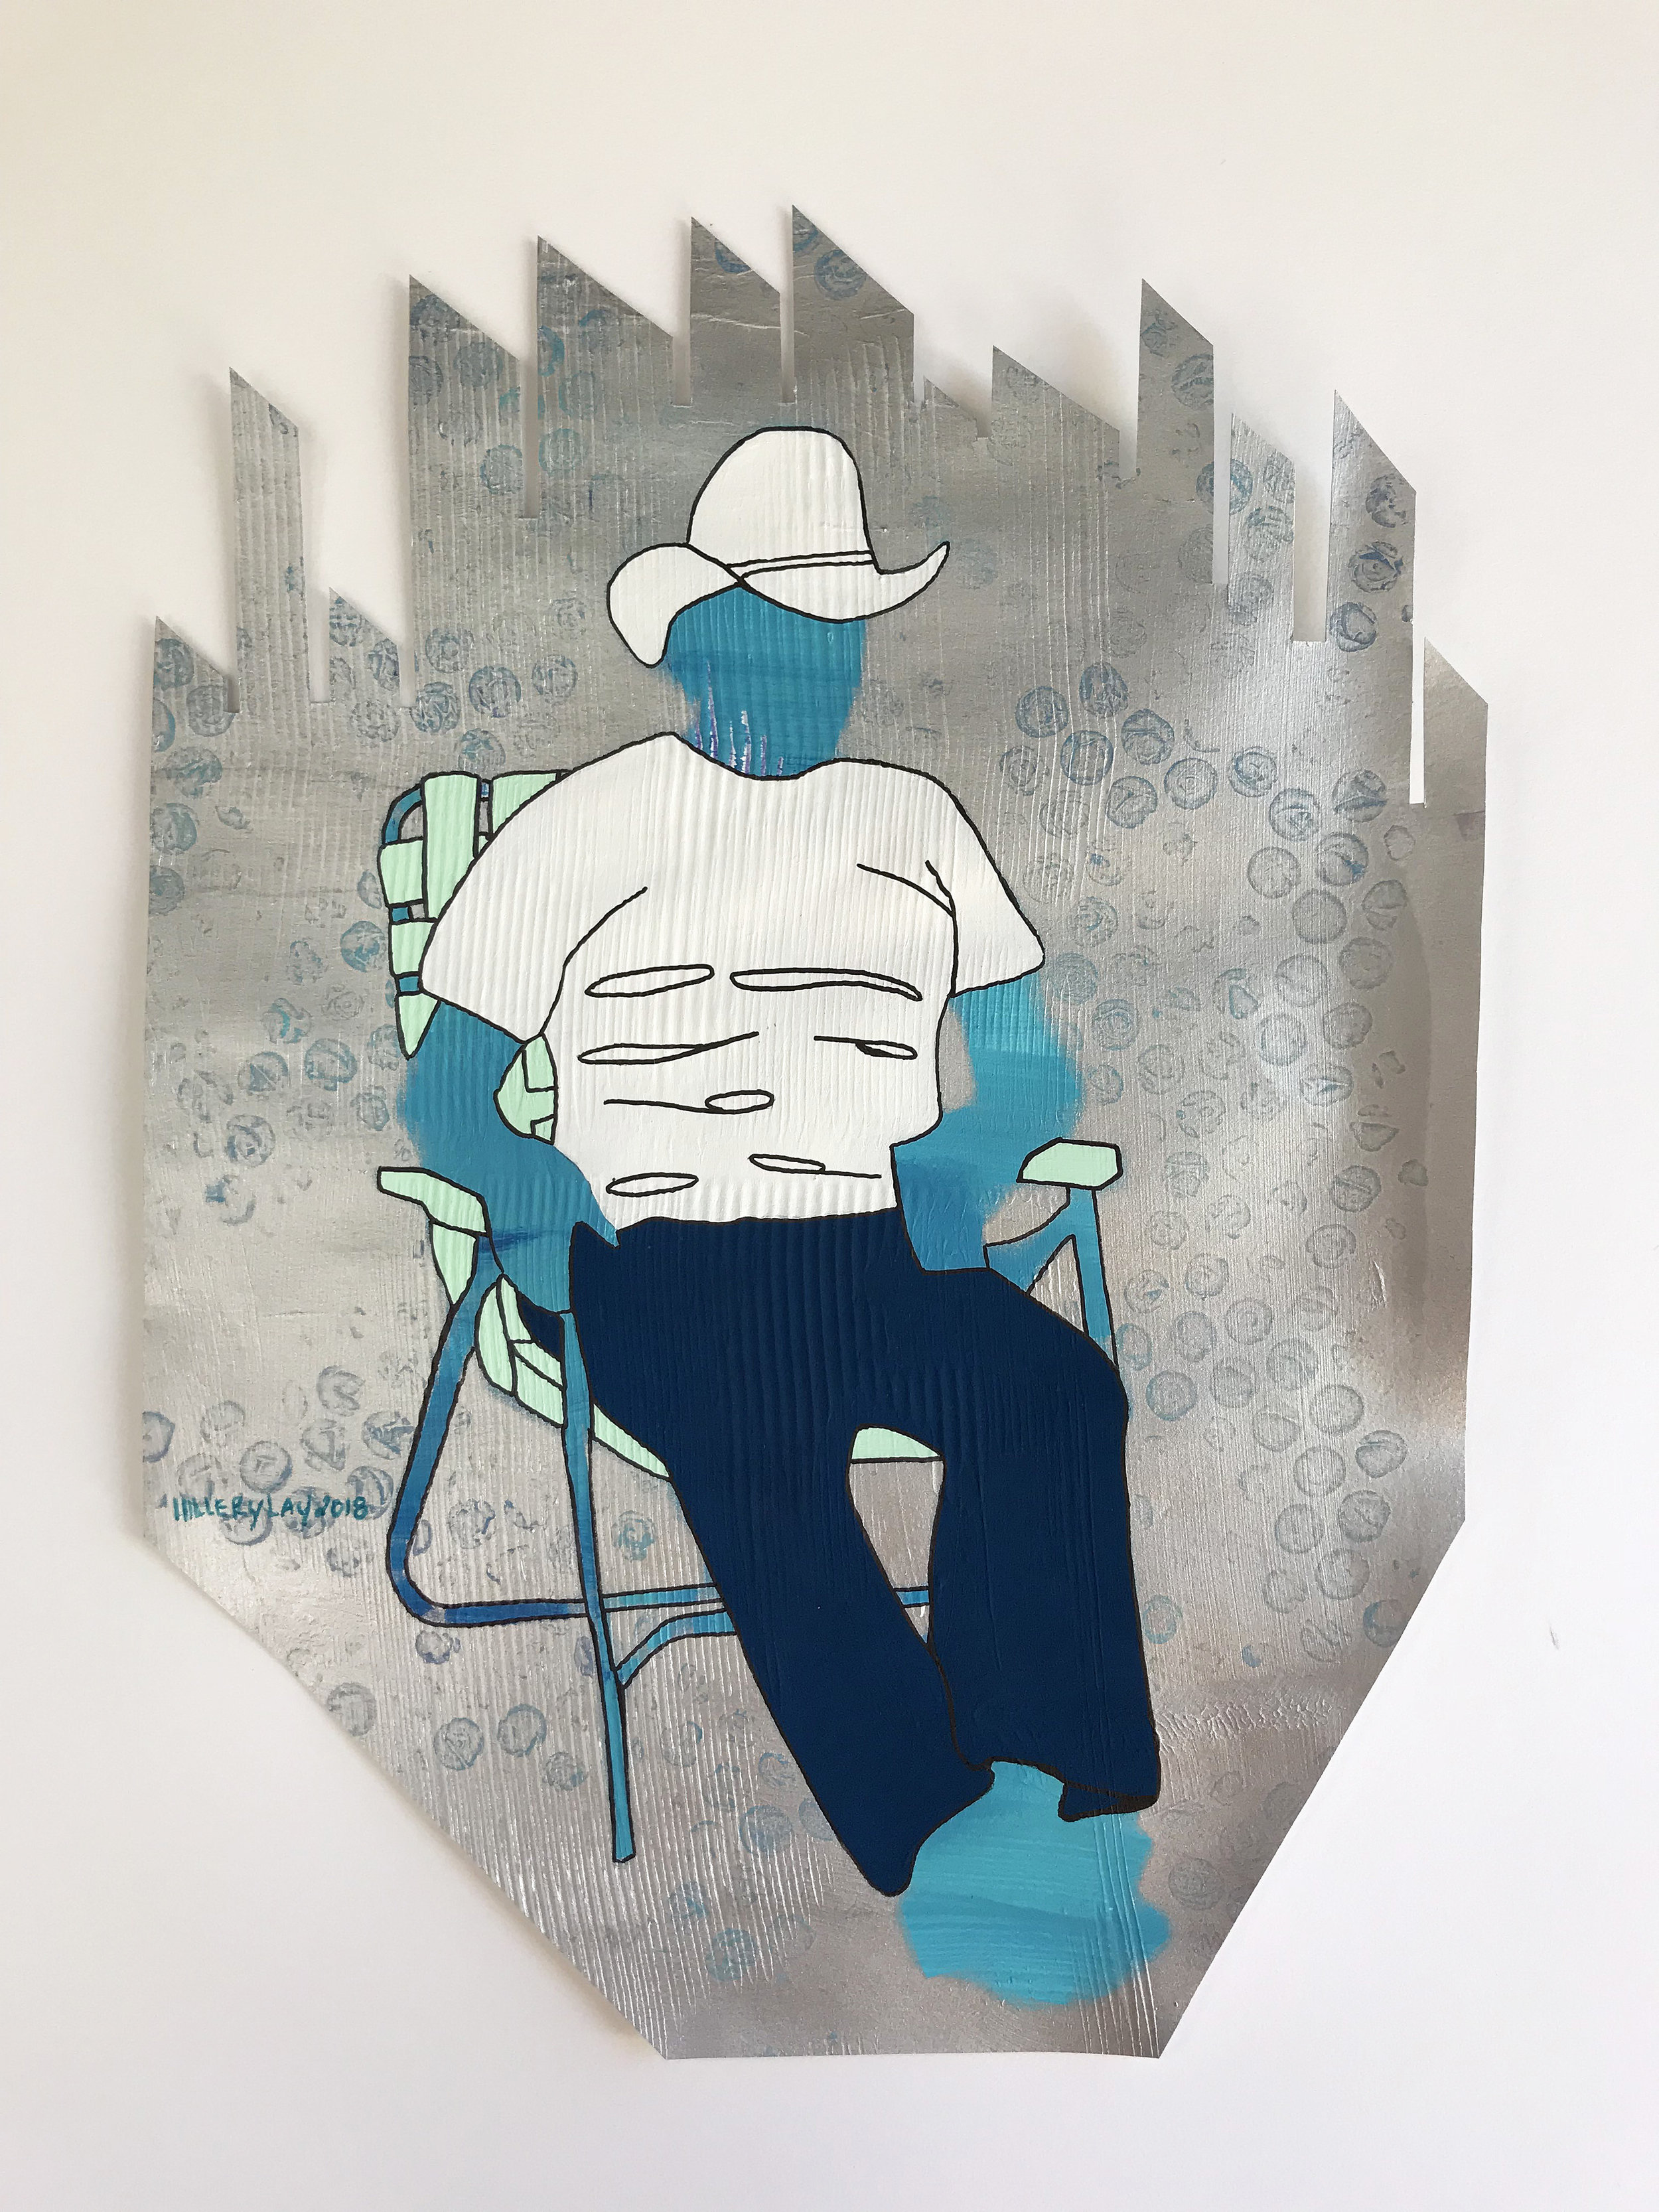 Lounge, Crabgrass Paper Cut 2018 mm 10x14 inches